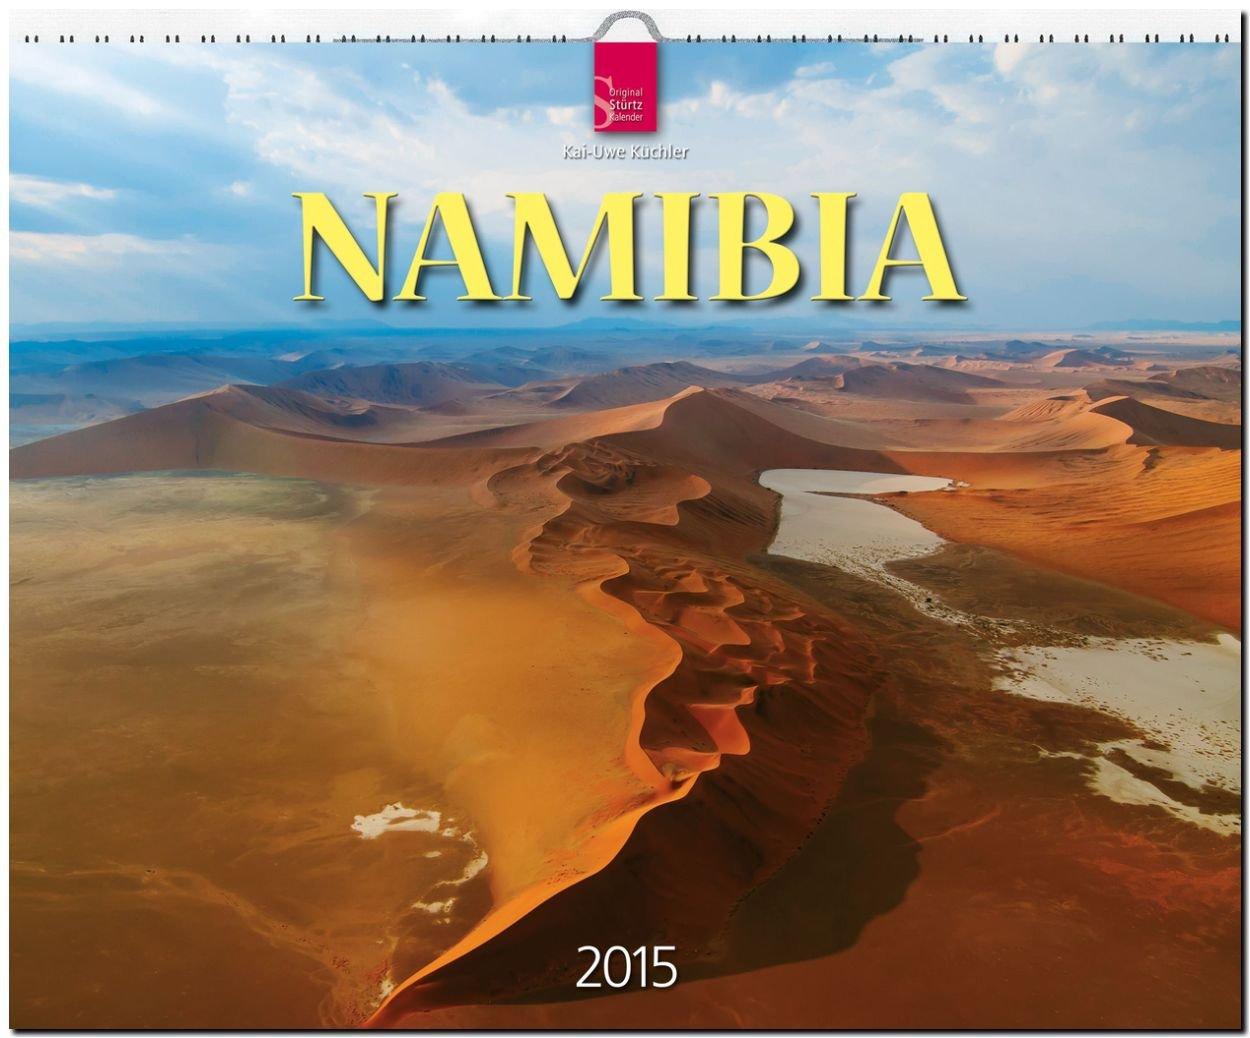 Namibia 2015 - Original Stürtz-Kalender - Großformat Kalender 60 x 48 cm